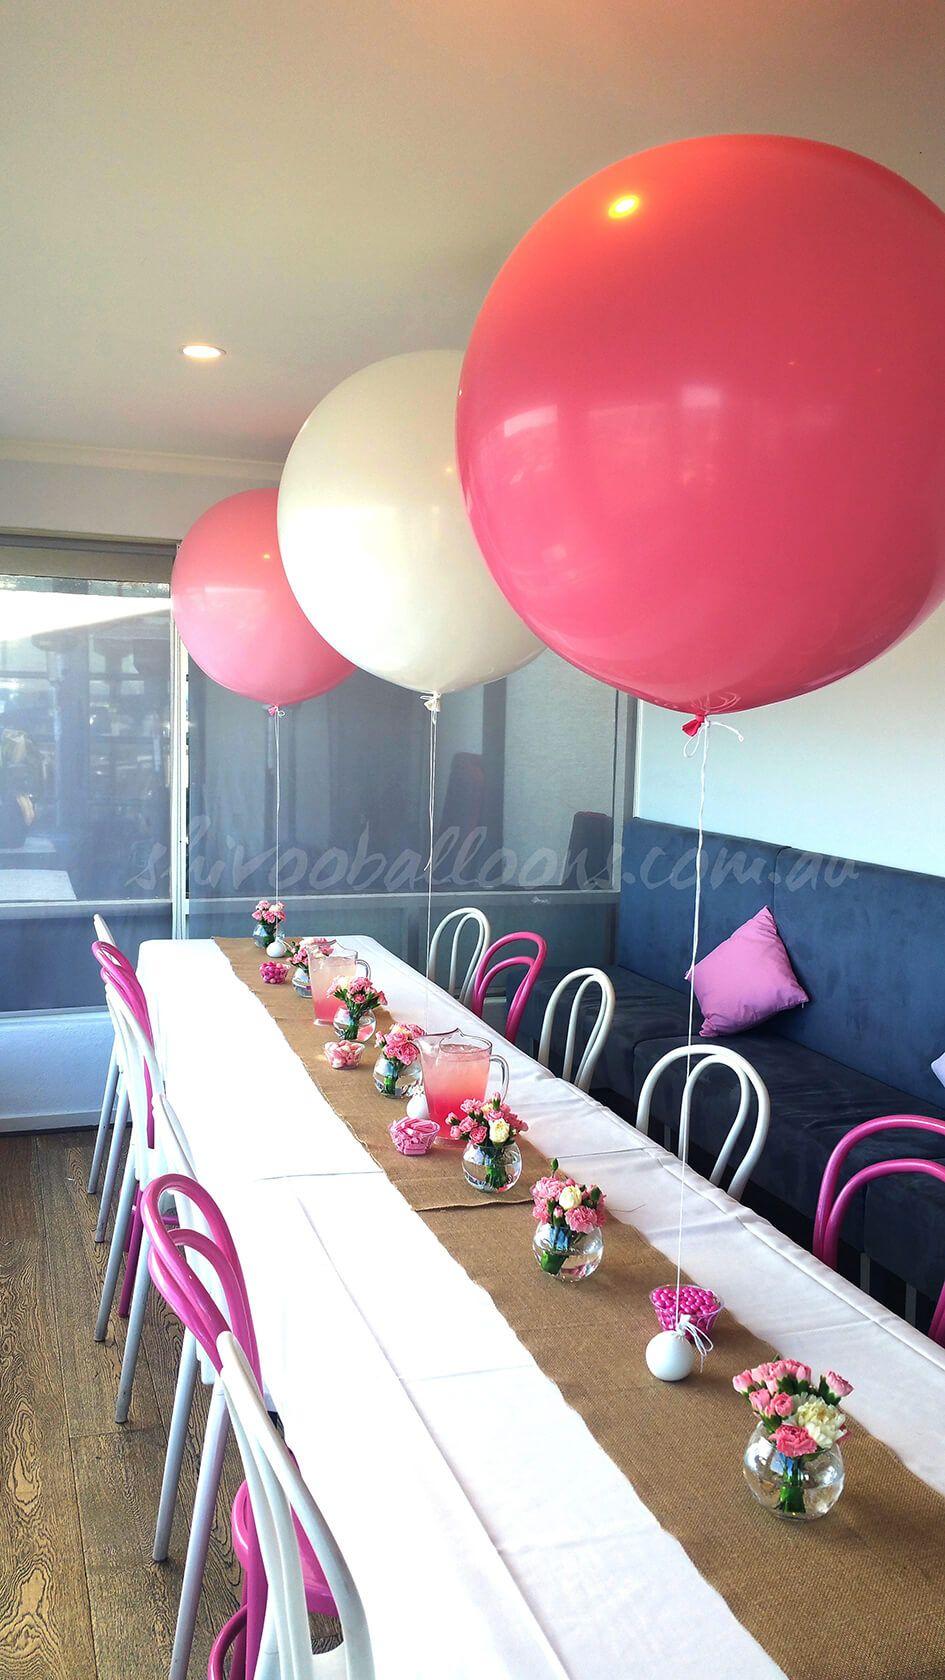 Shivoo Balloons Balloons, Balloon design, Balloon